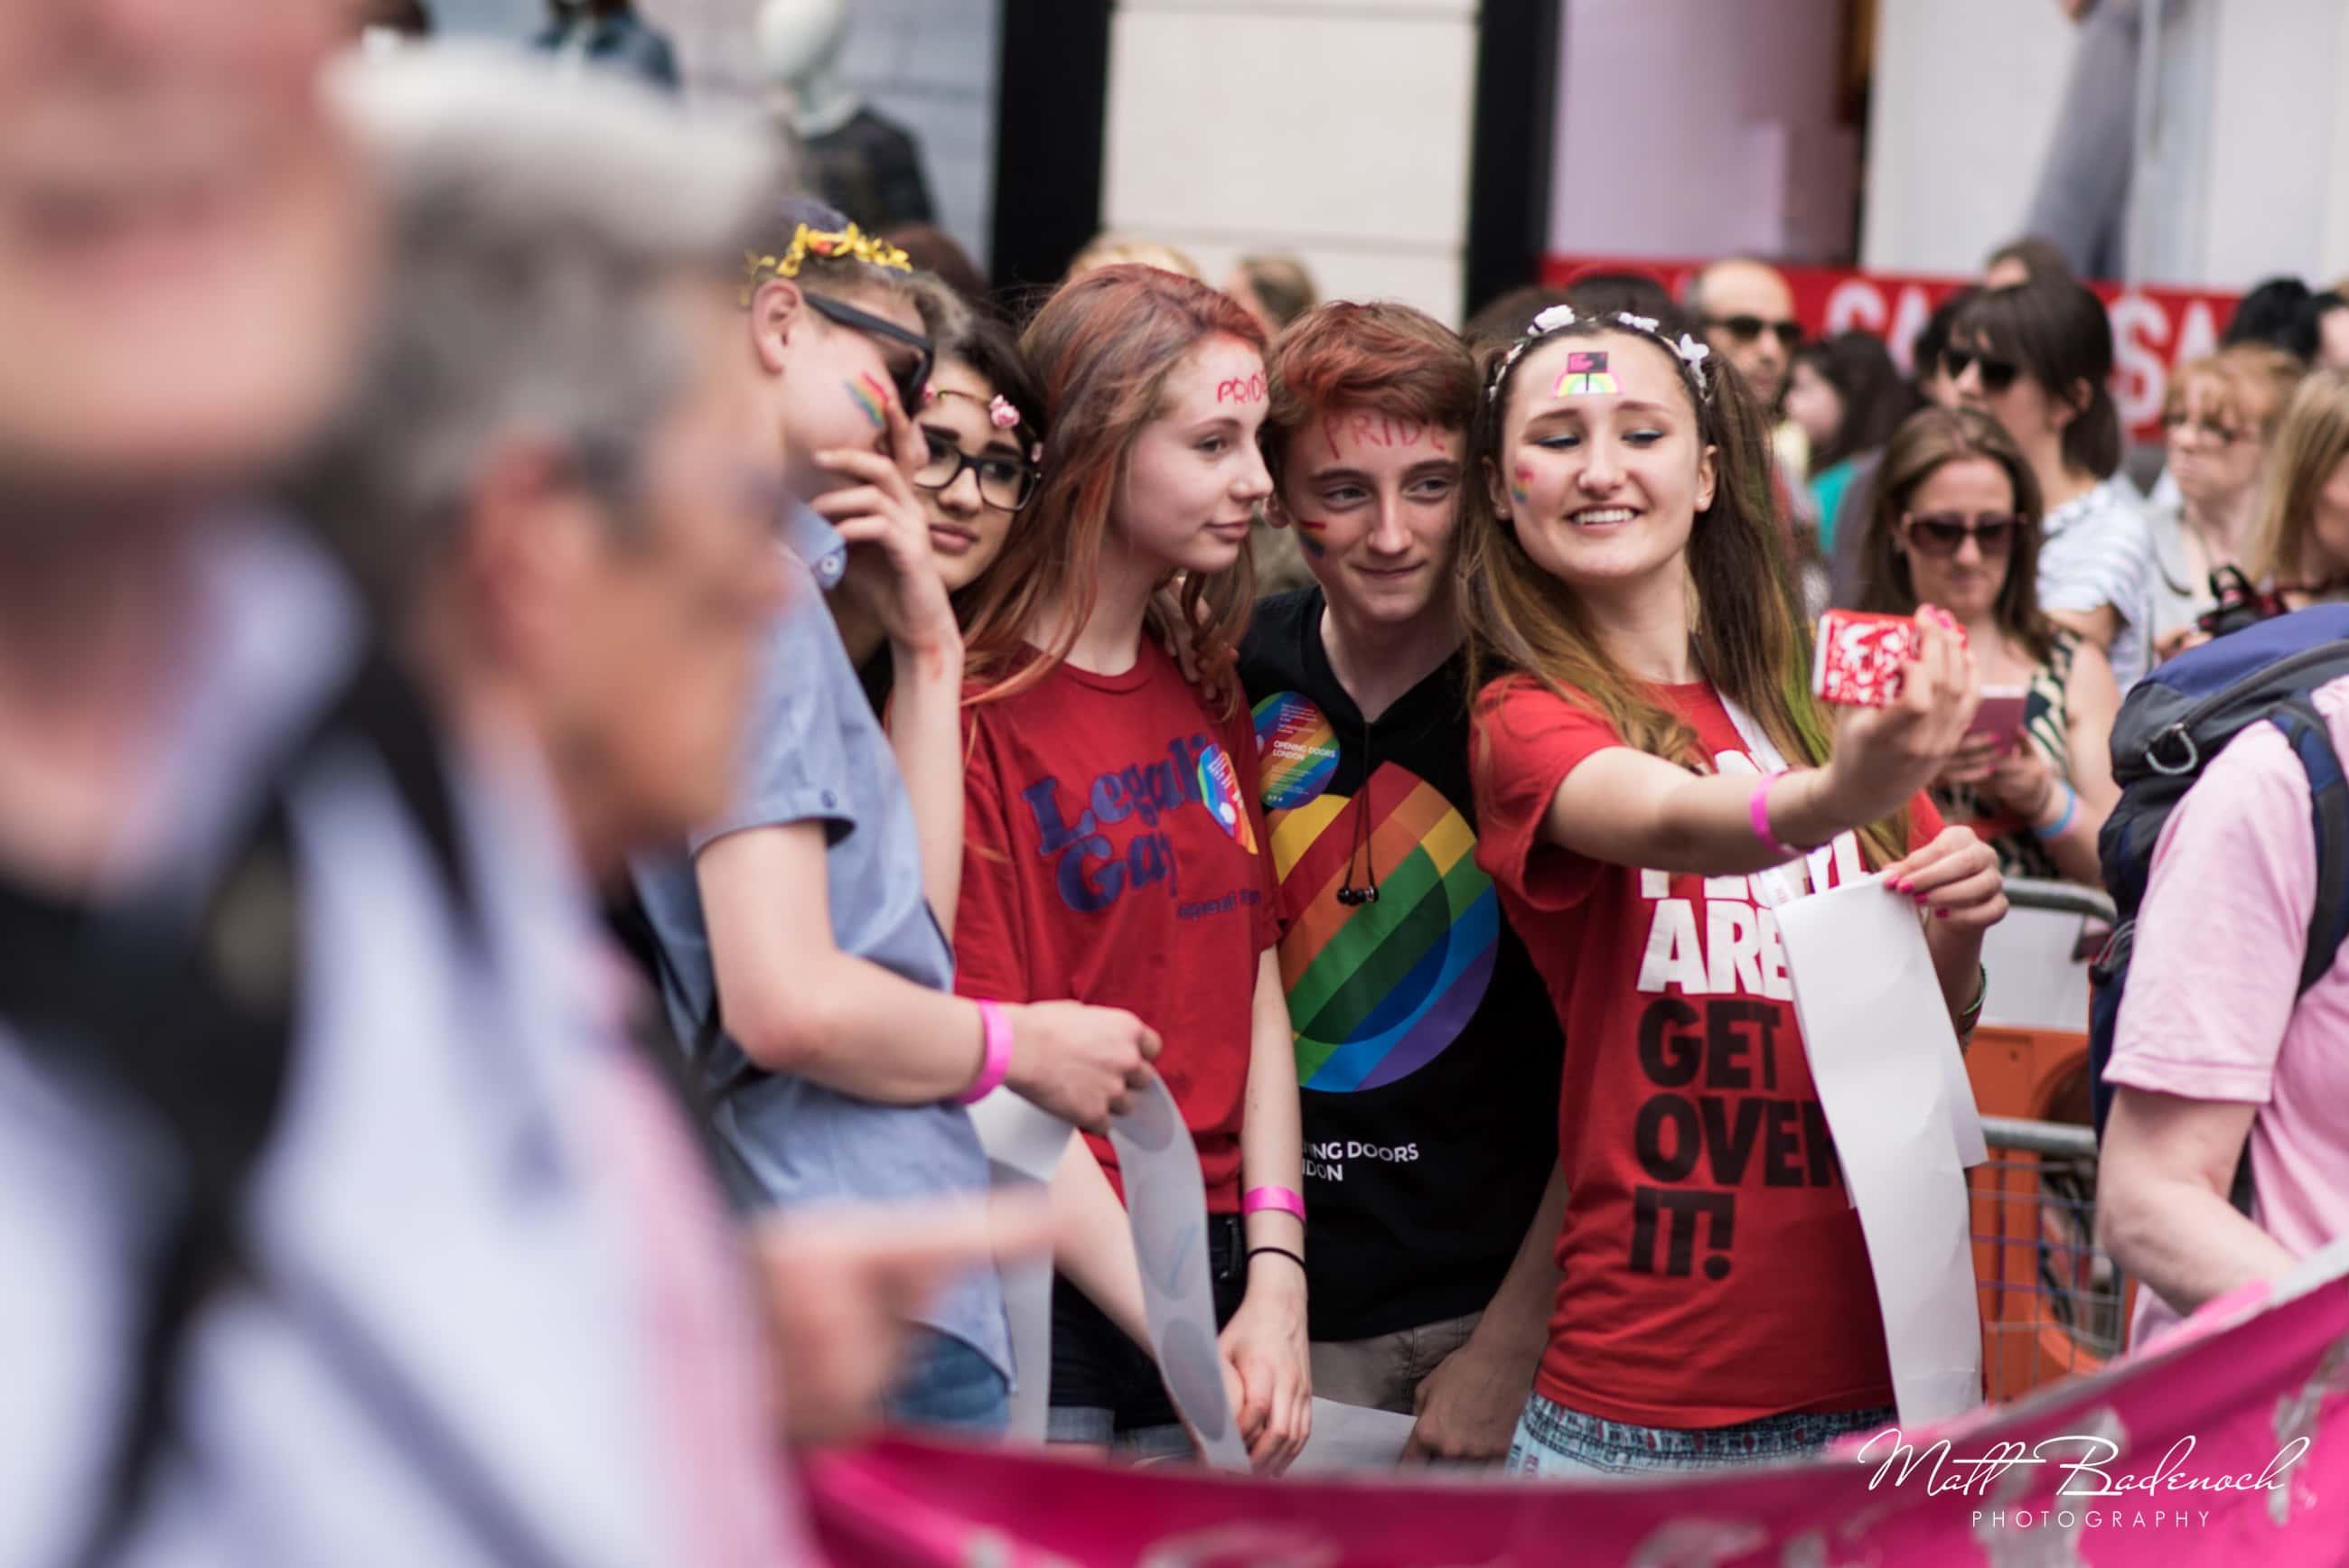 Opening Doors London, London Pride Parade 2015 photos